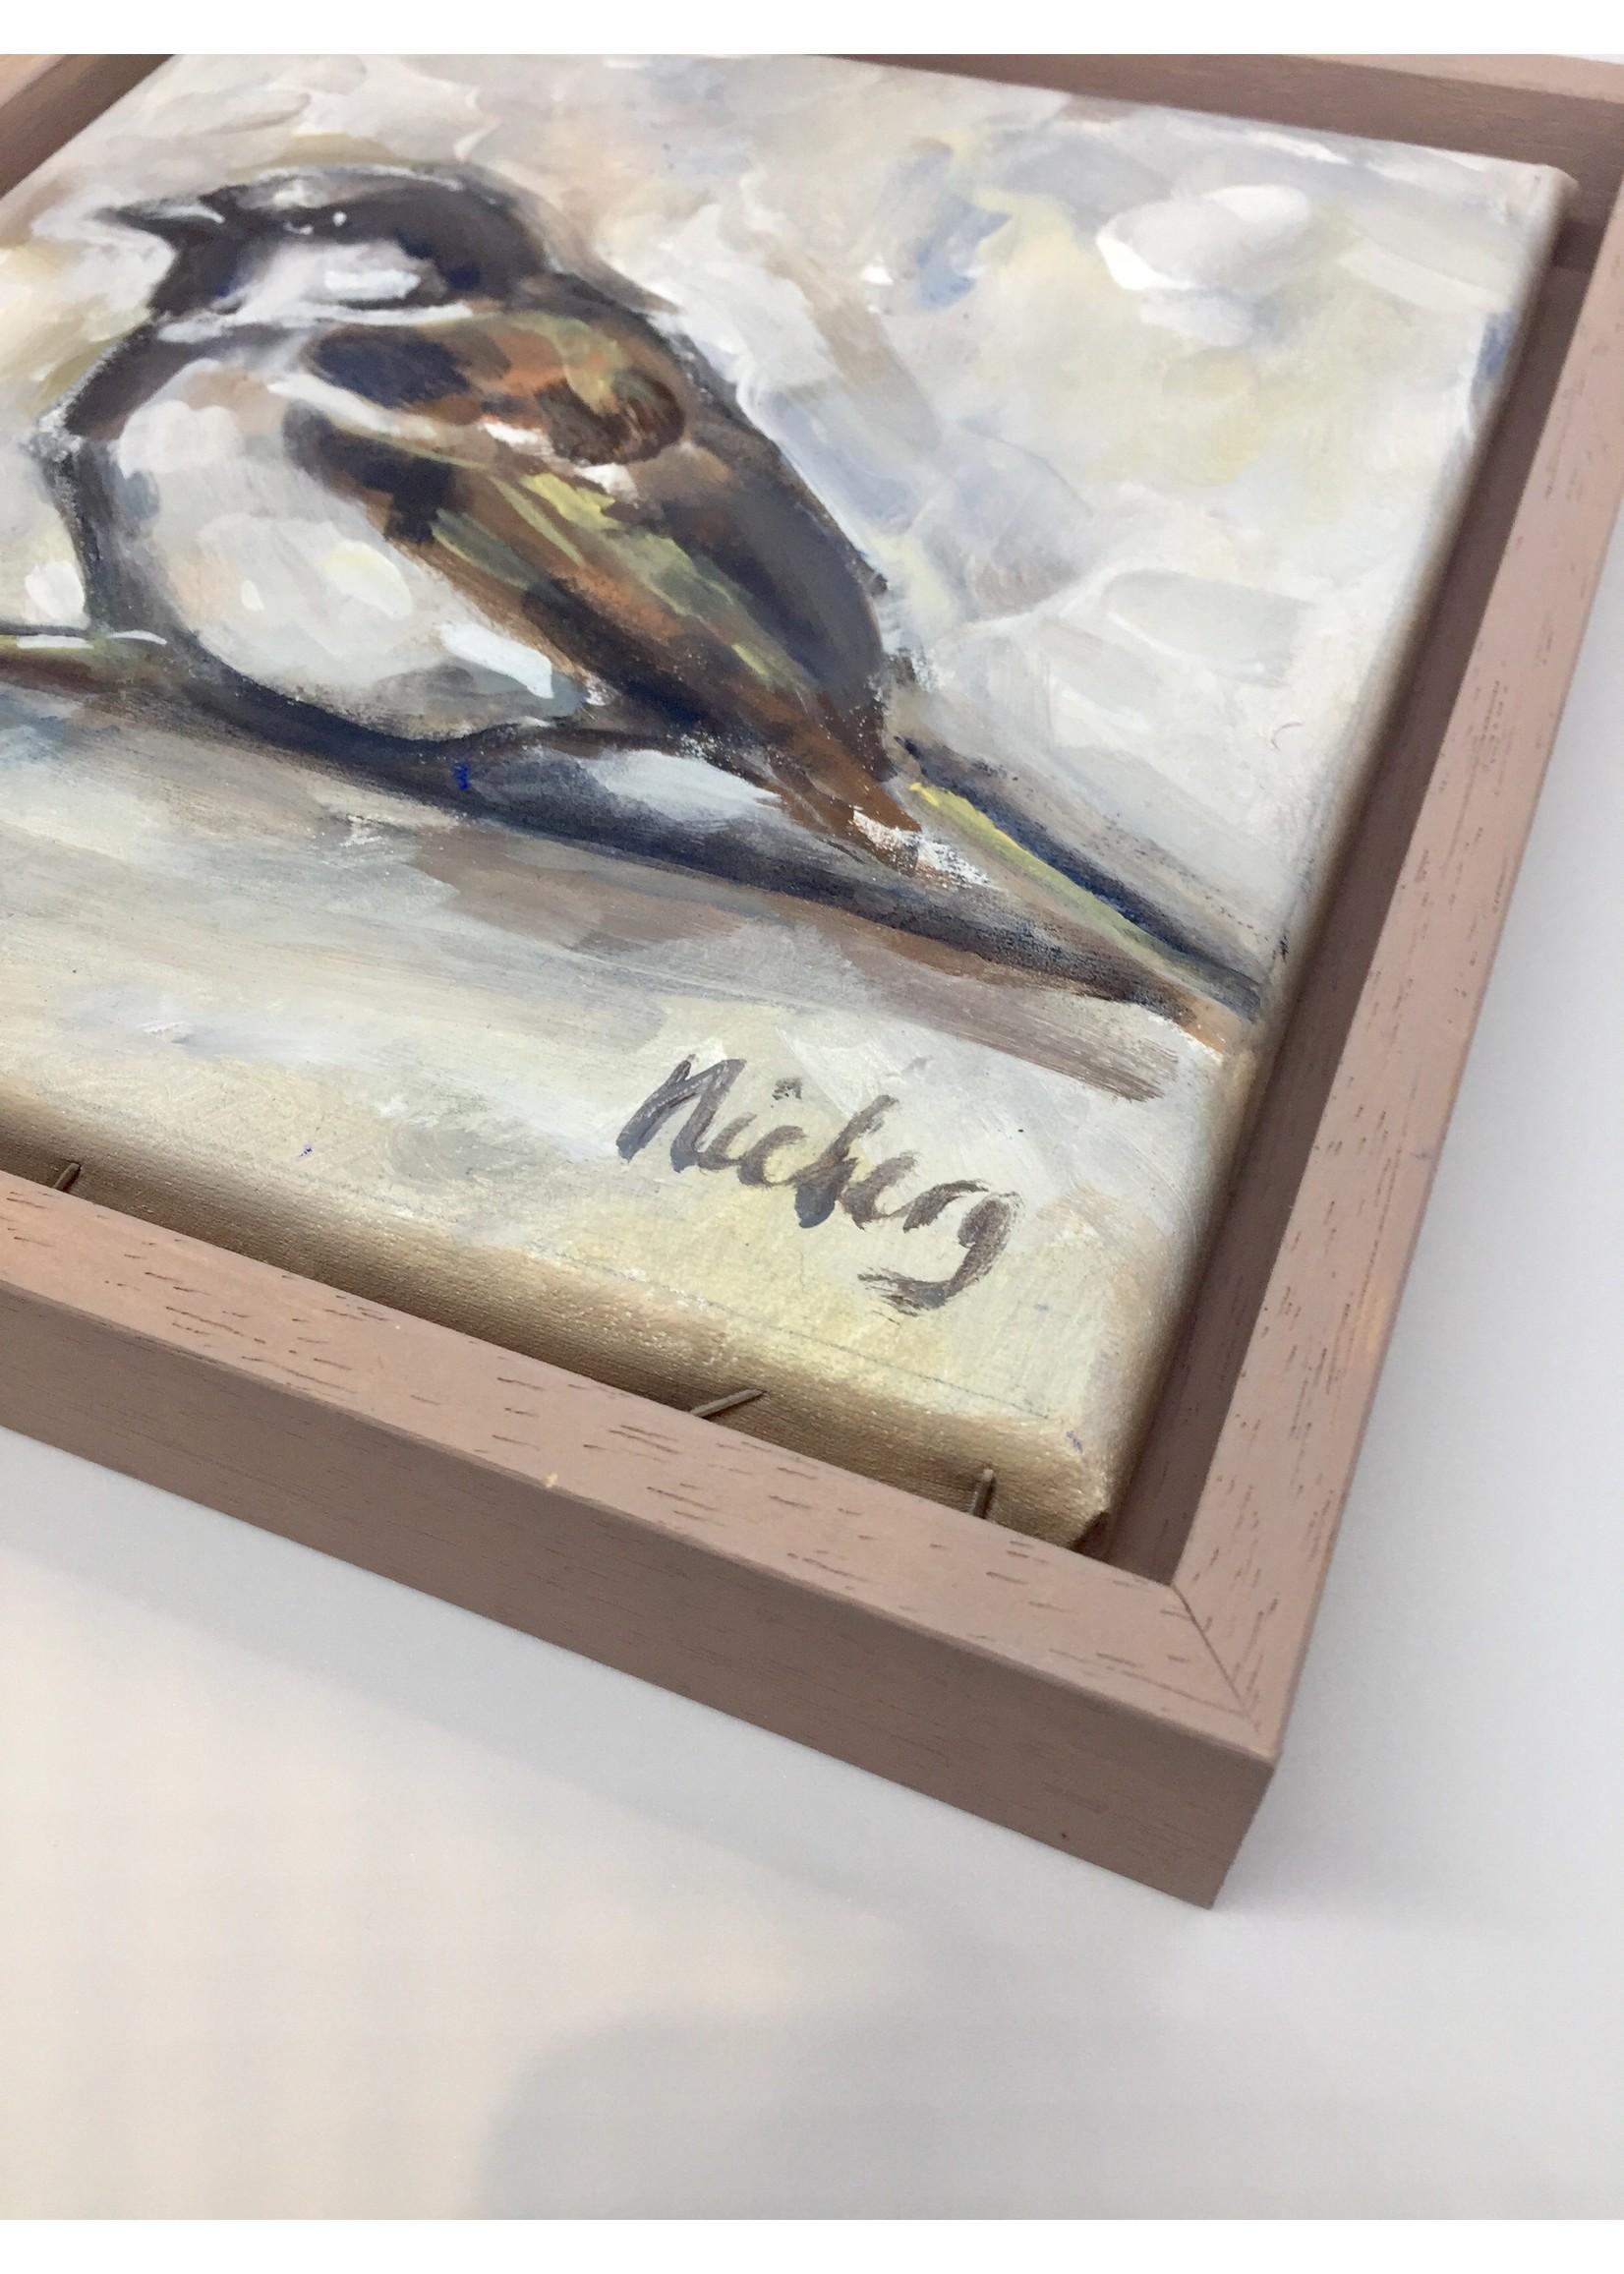 'Mus' - Monique Nieberg  (Acryl auf Leinwand)